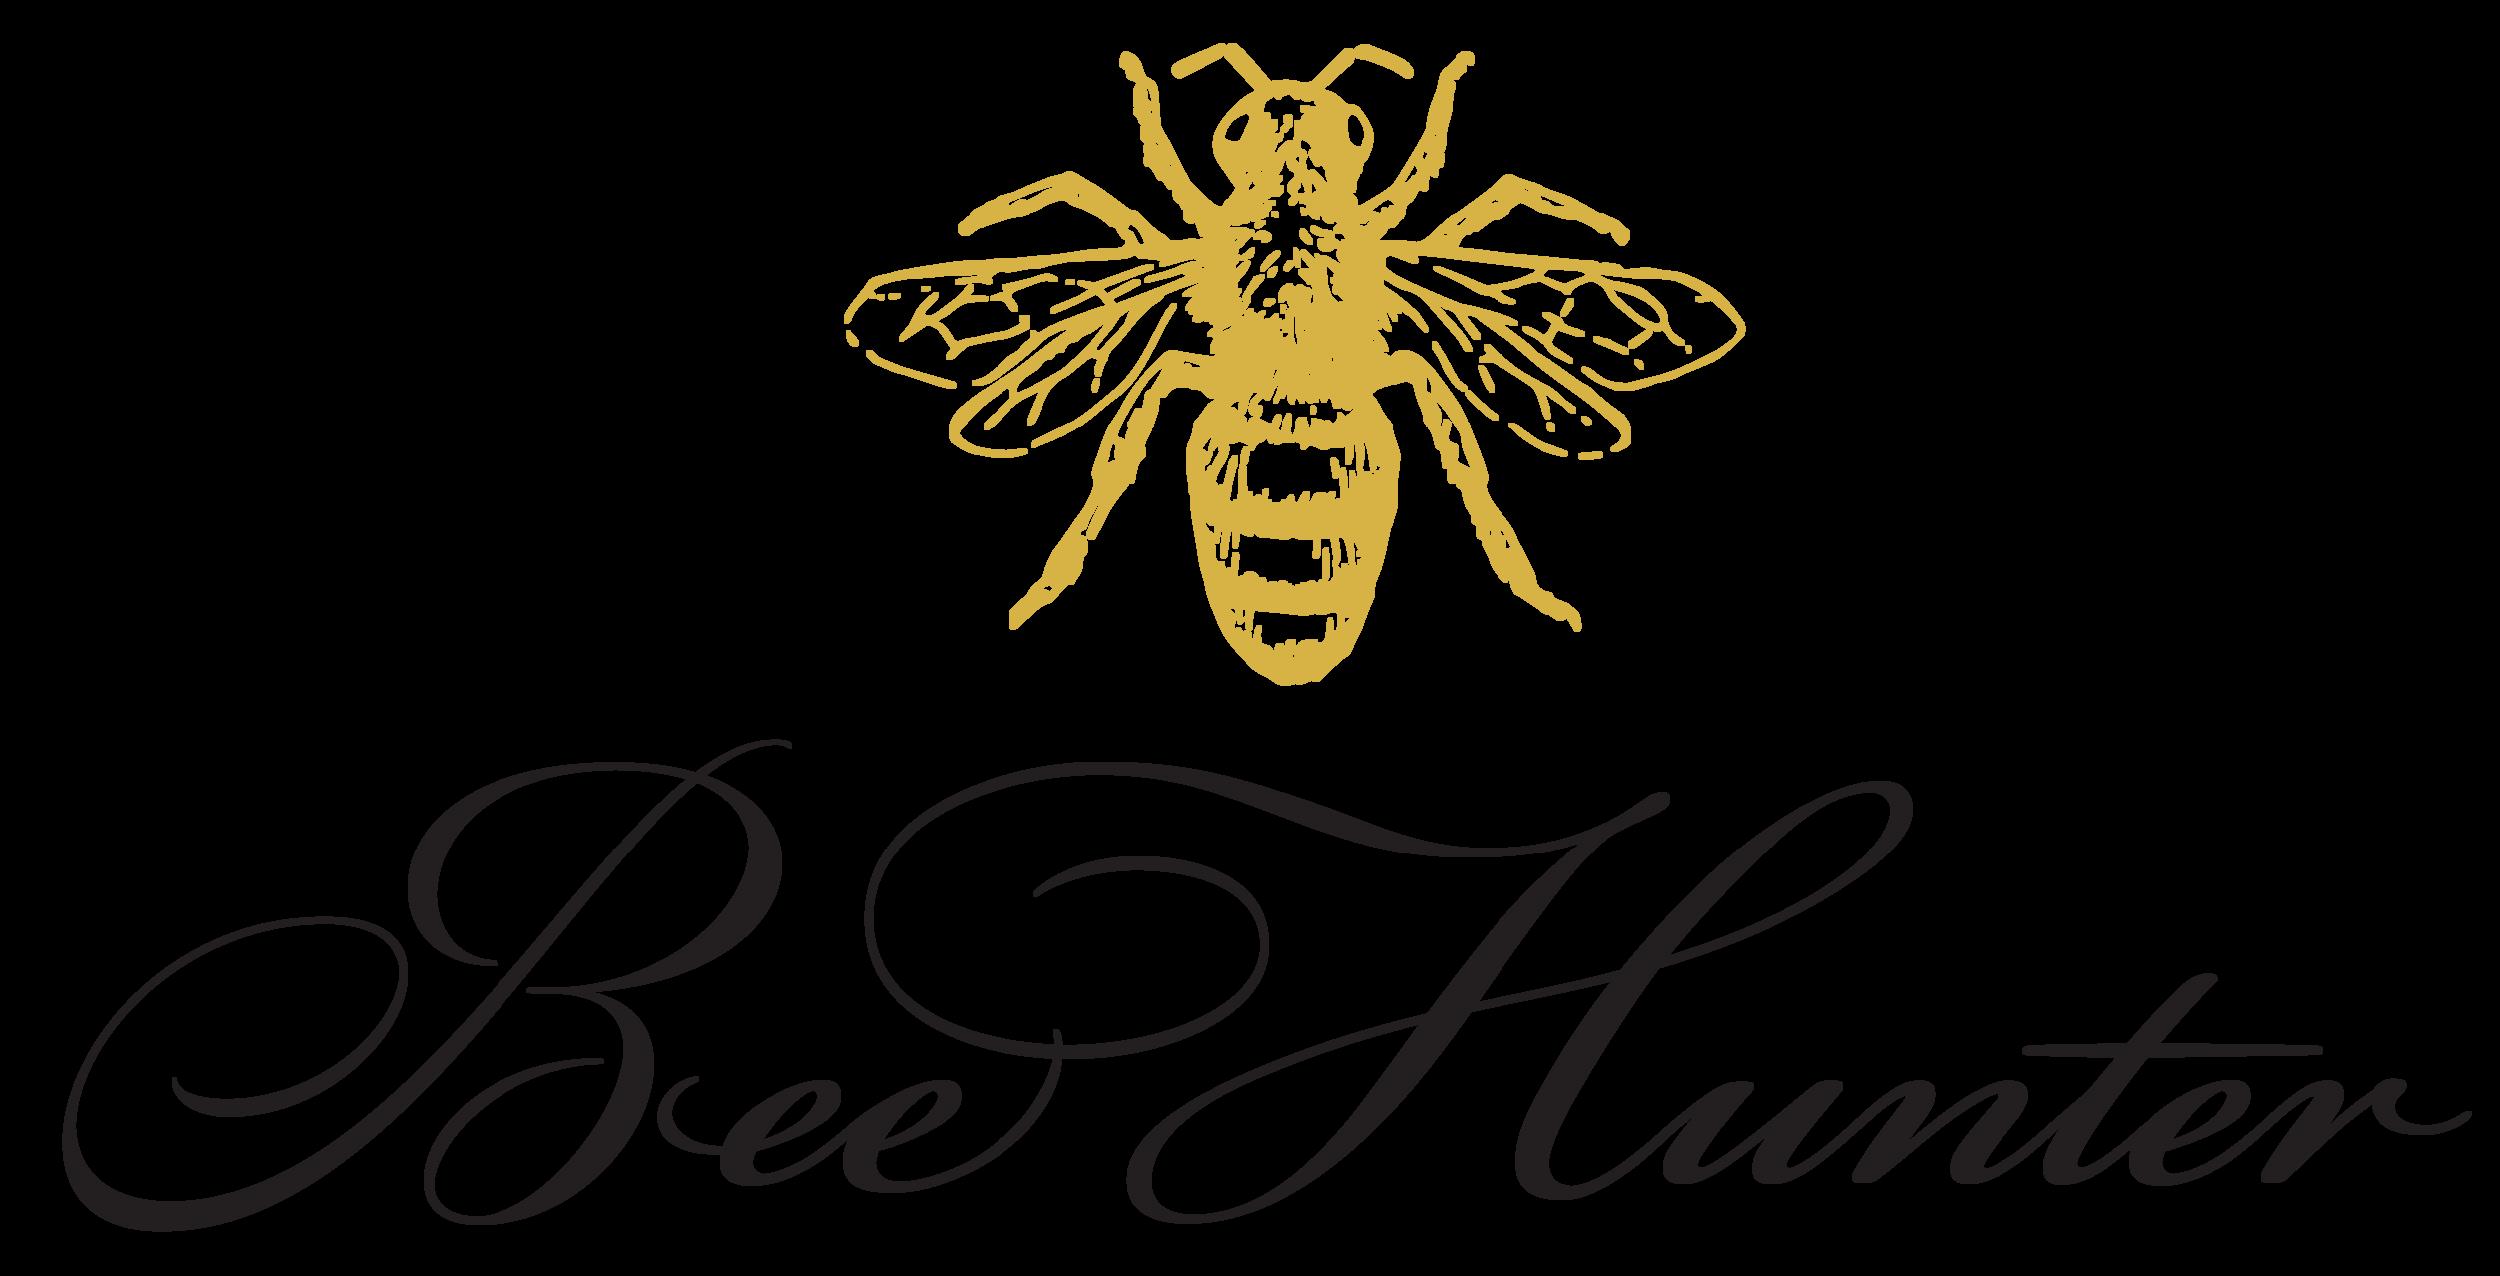 Bee-BeeHunterLogoLarge.png